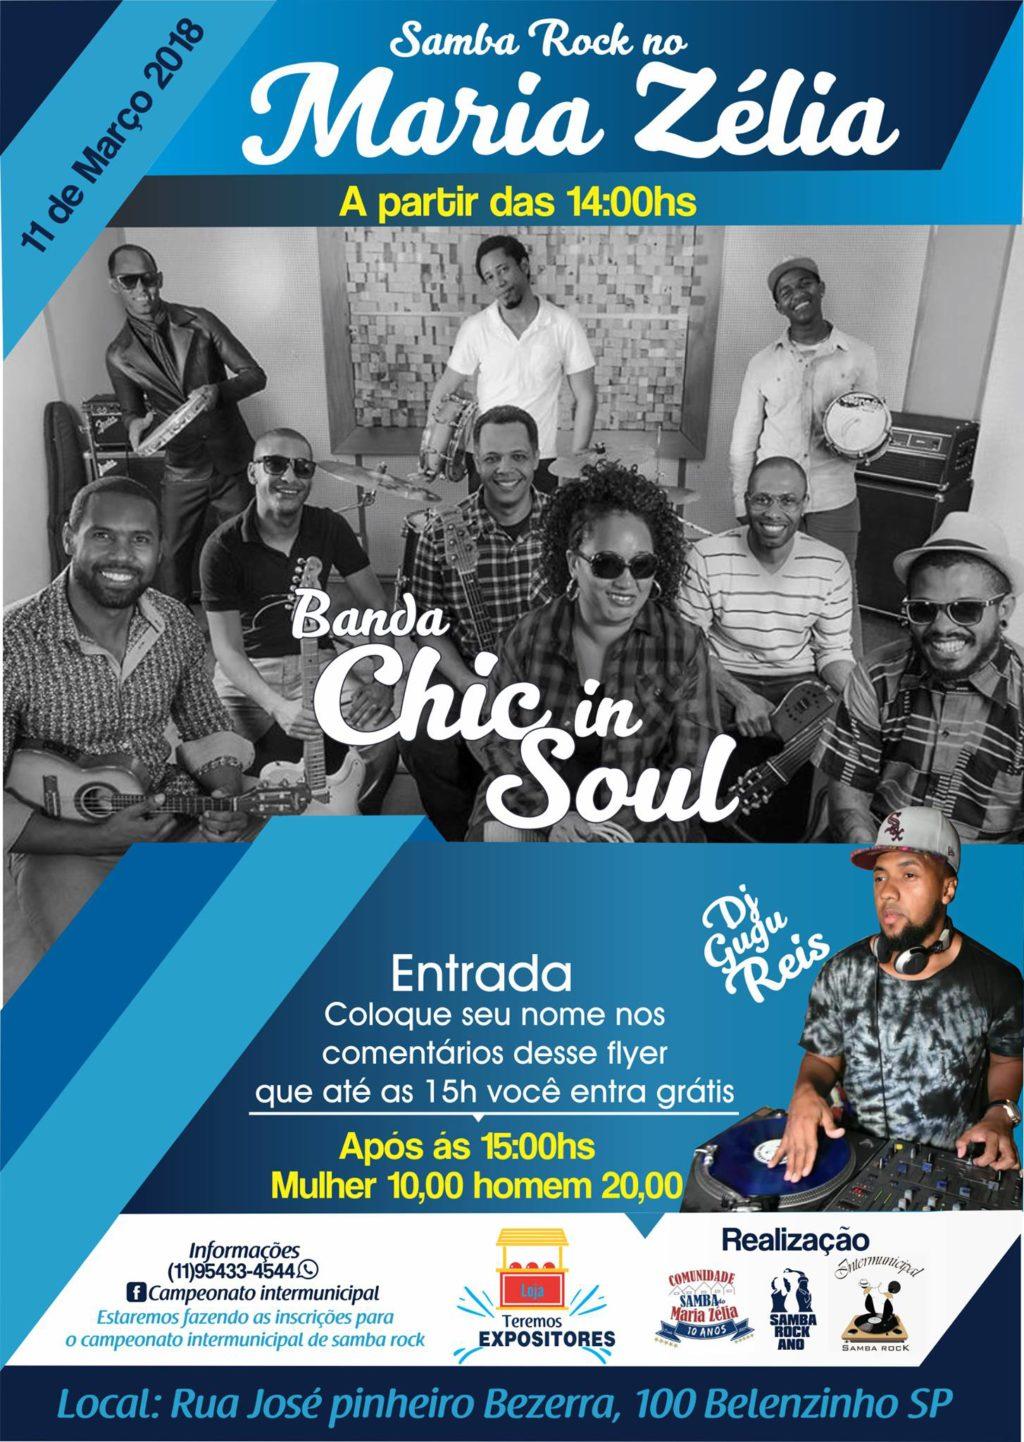 Samba Rock no Maria Zélia com banda Chic in Soul e DJ Gugu Reis #nota